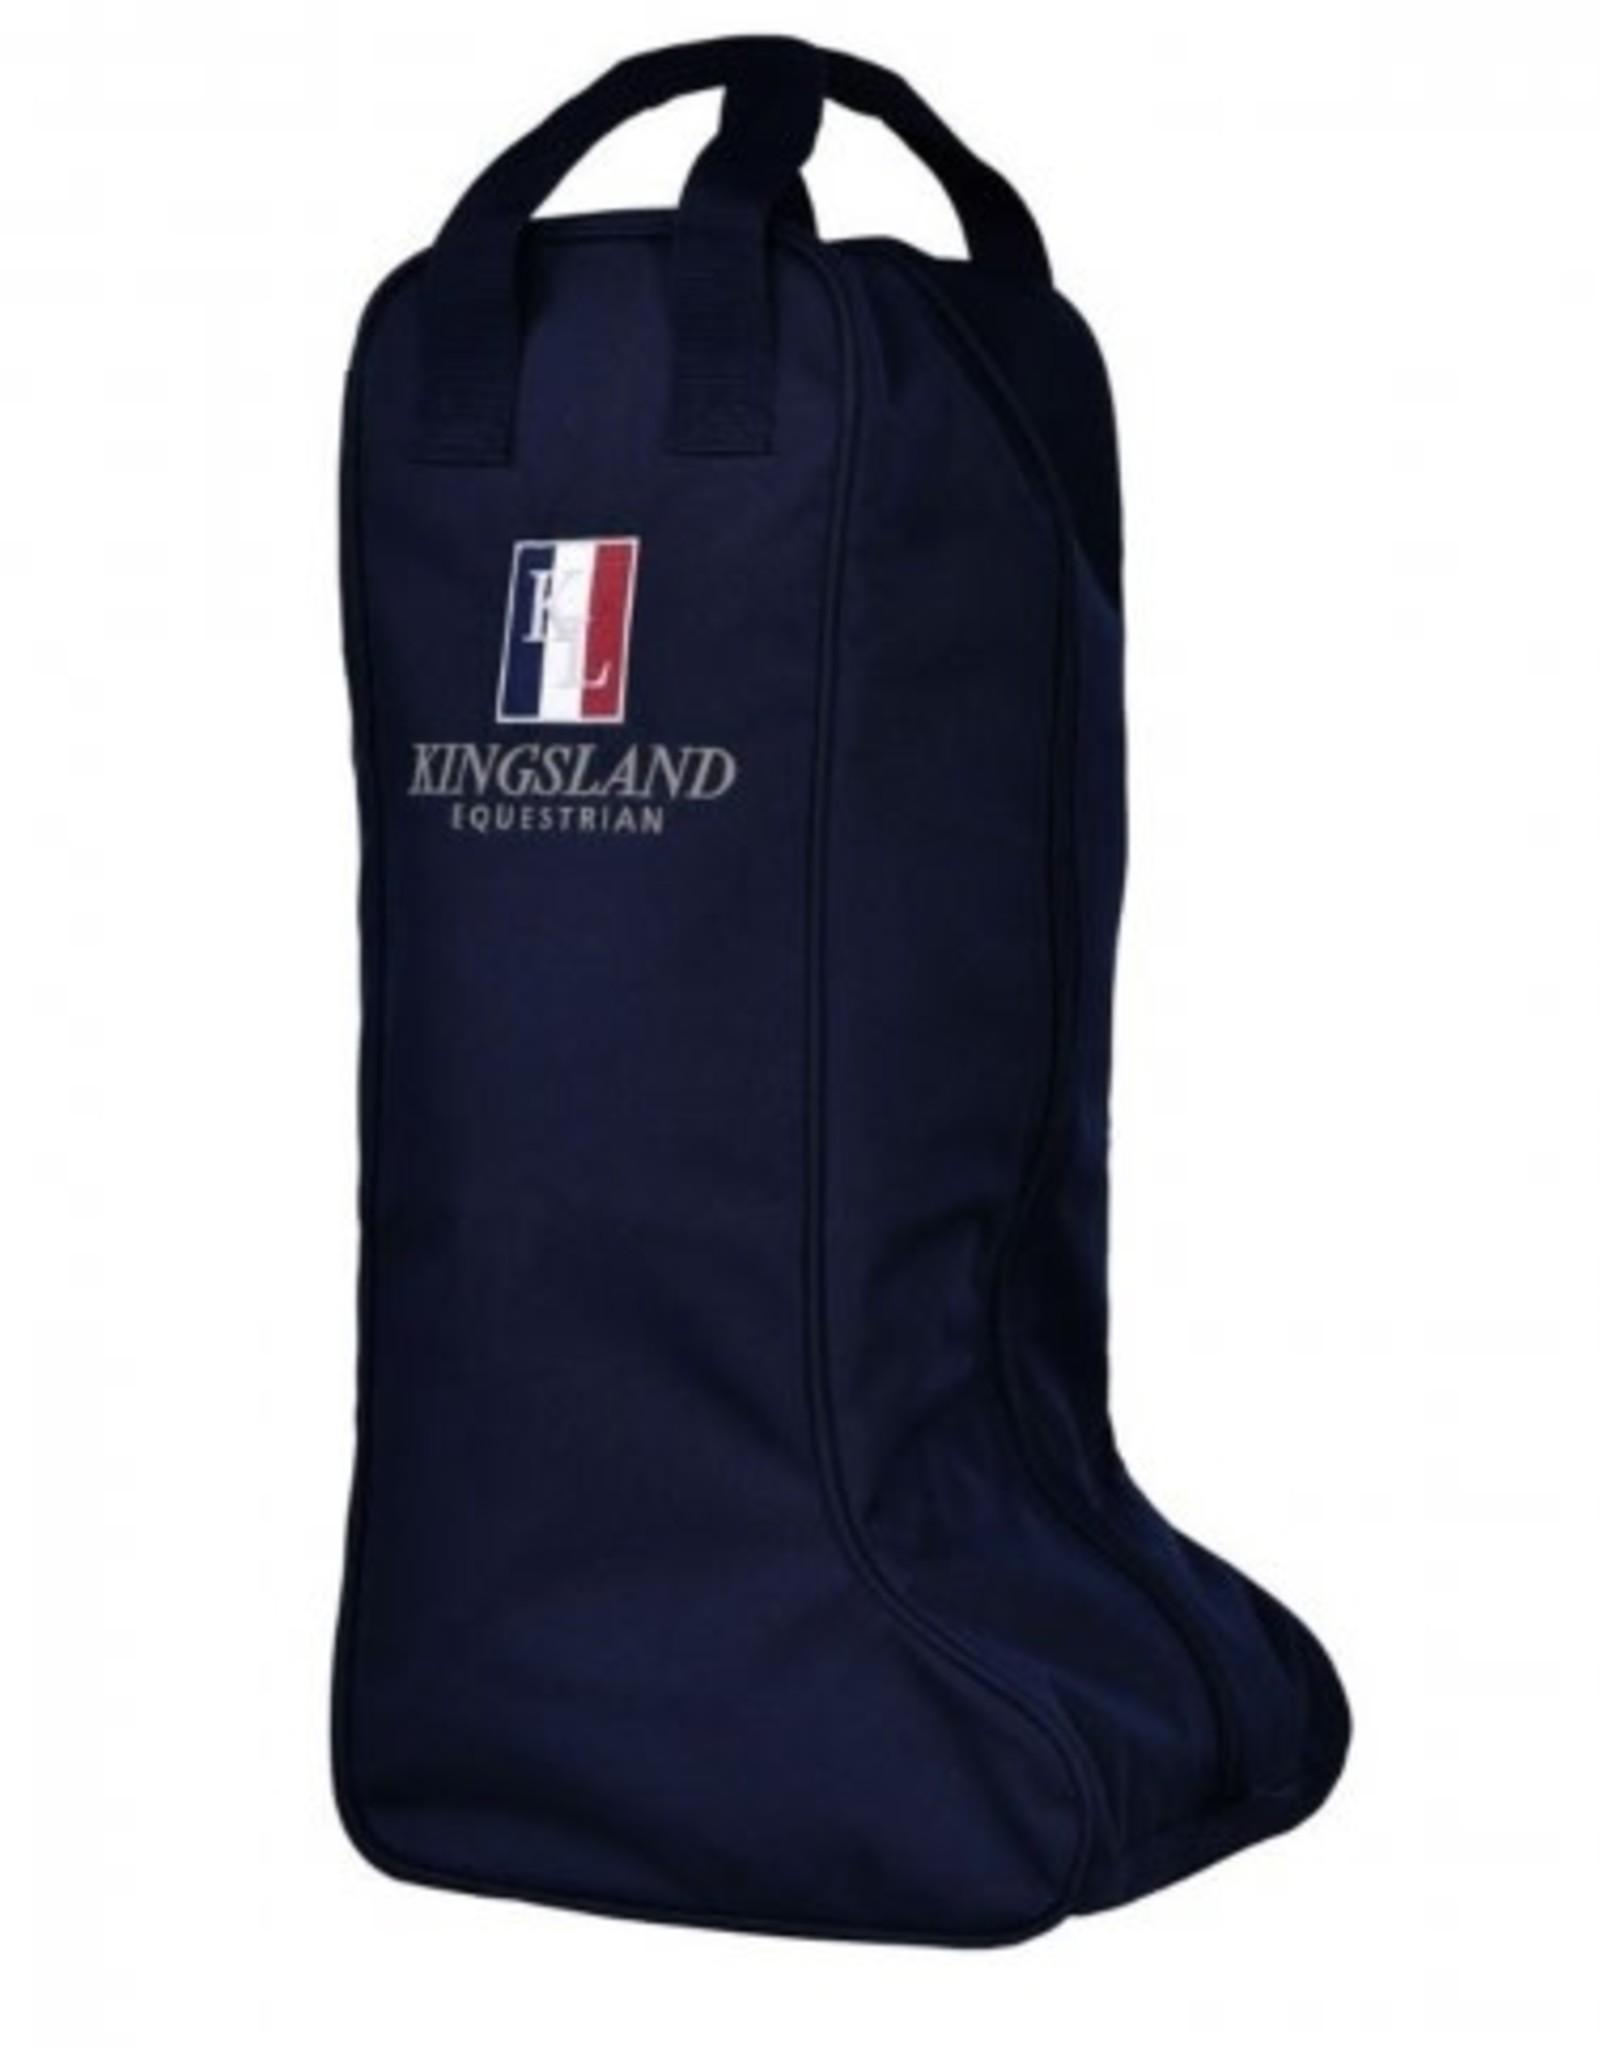 Kingsland KL Classis boot bag navy